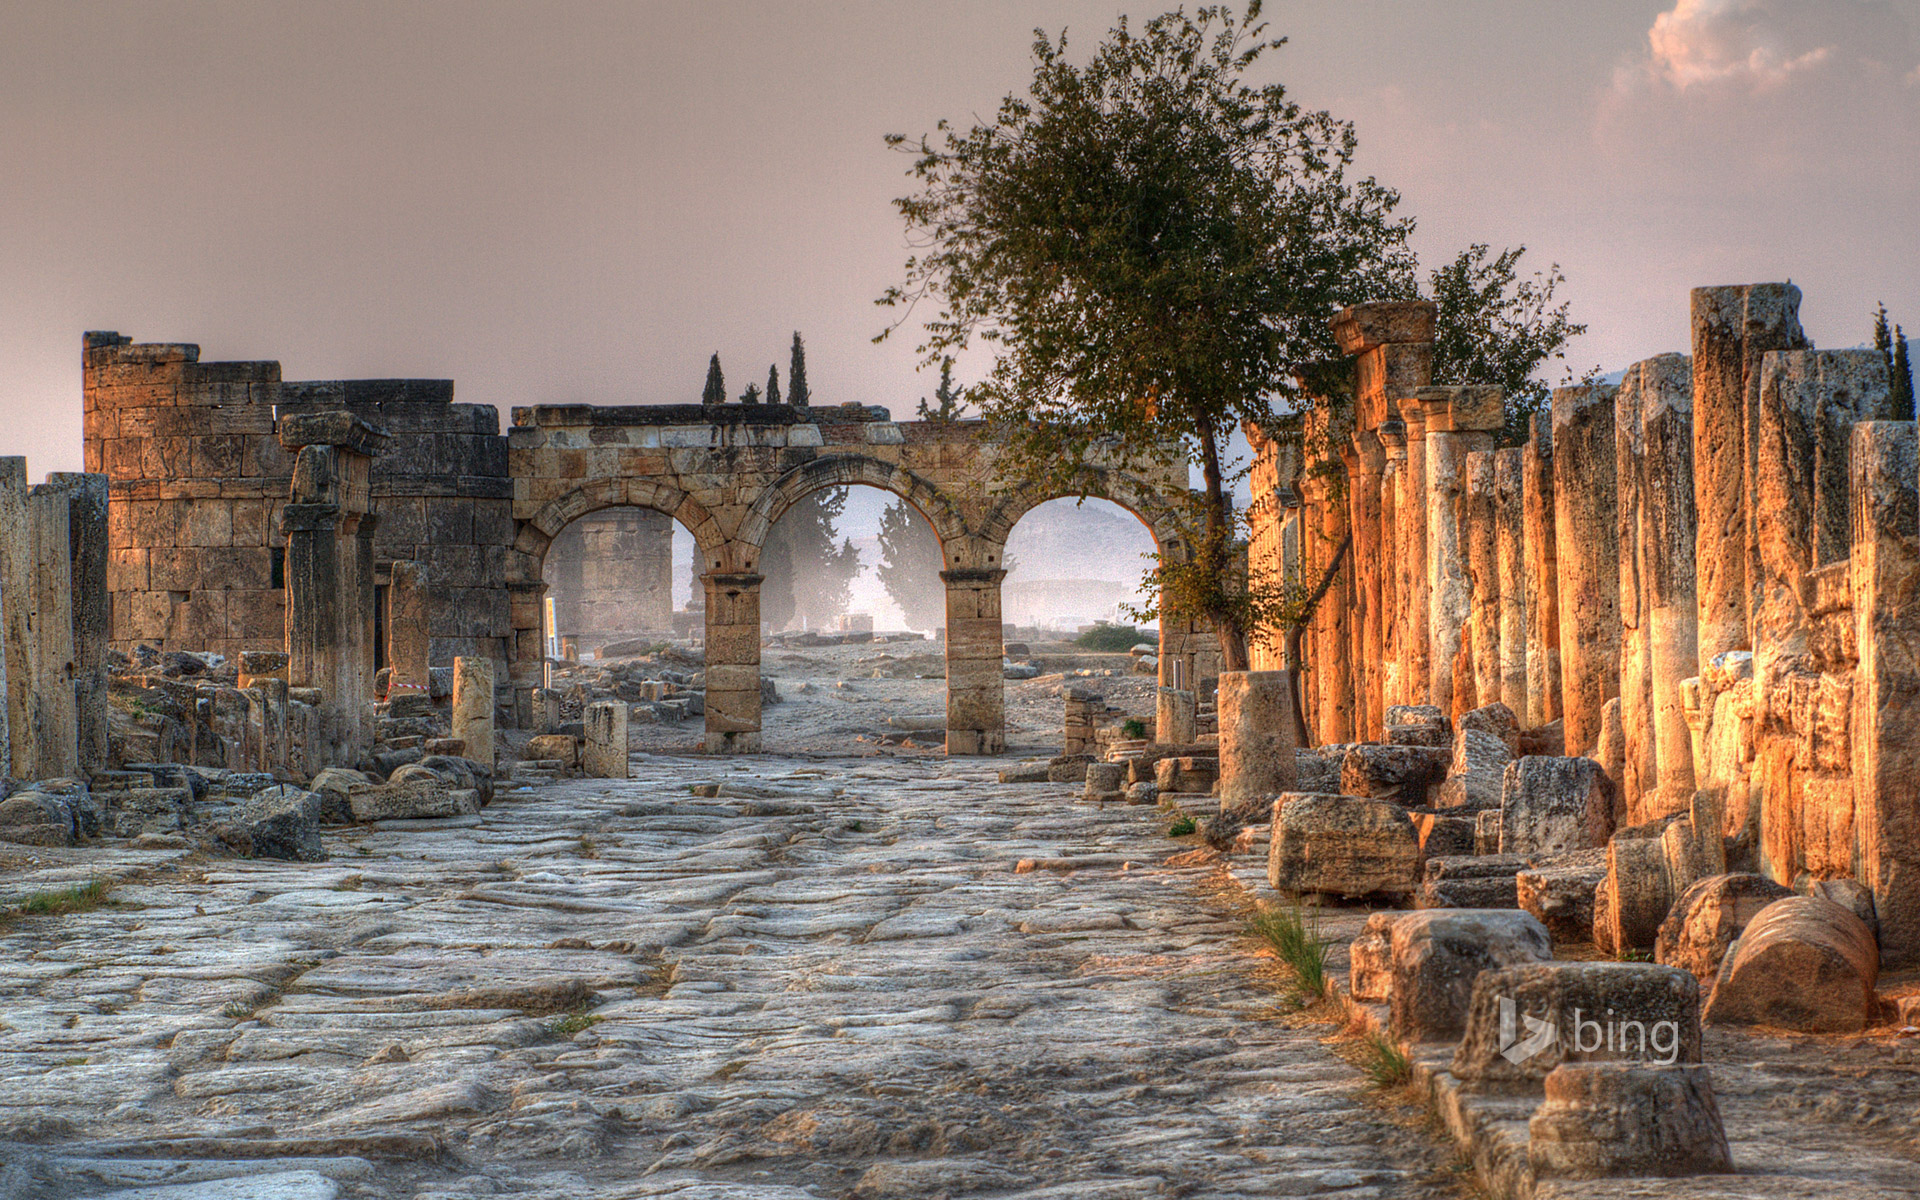 Ancient city of Hierapolis, adjacent to Pamukkale, Turkey